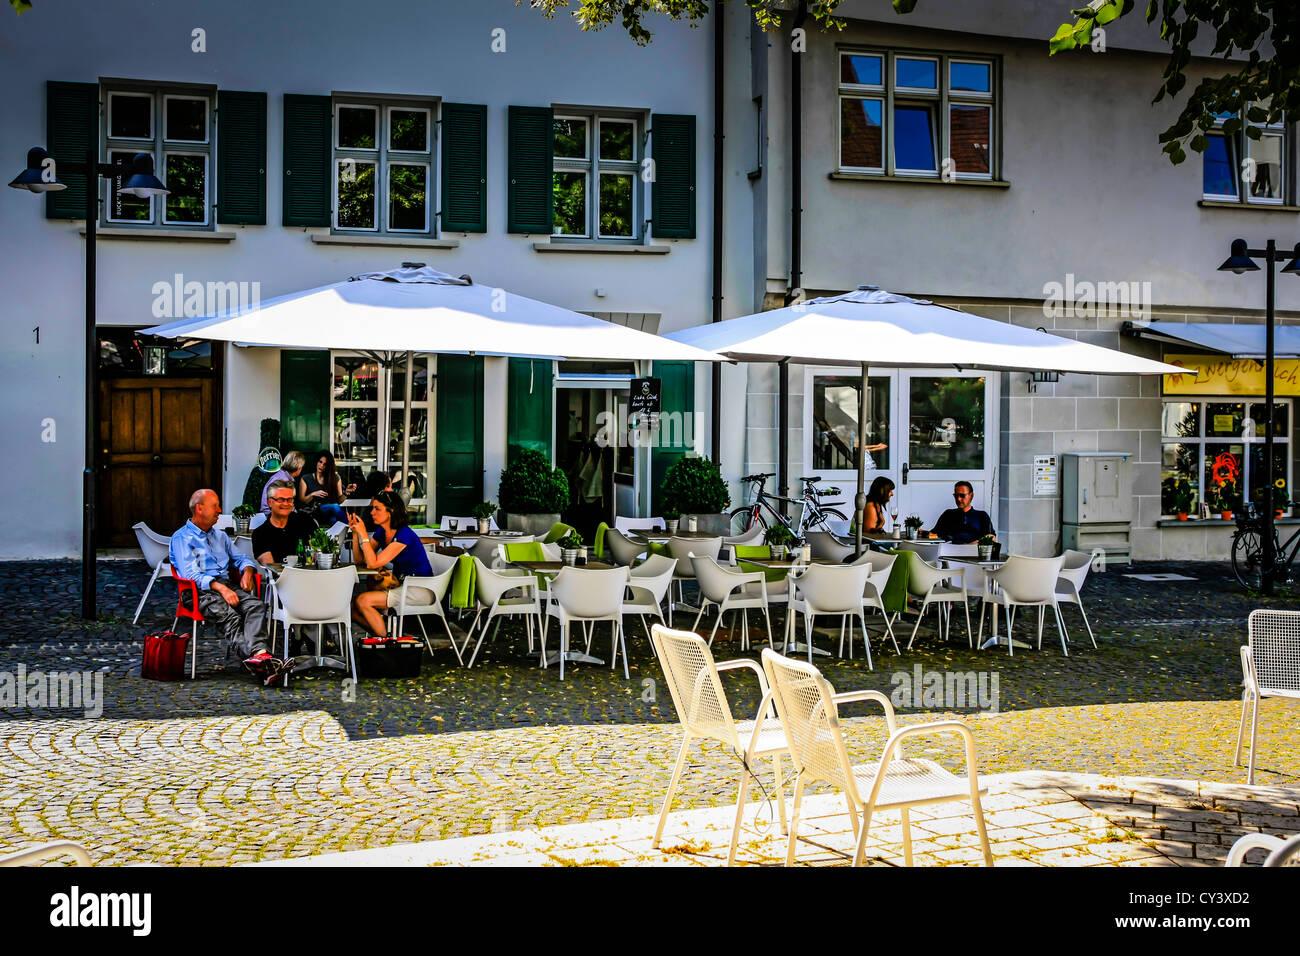 Ulm Restaurant Stockfotos & Ulm Restaurant Bilder - Alamy